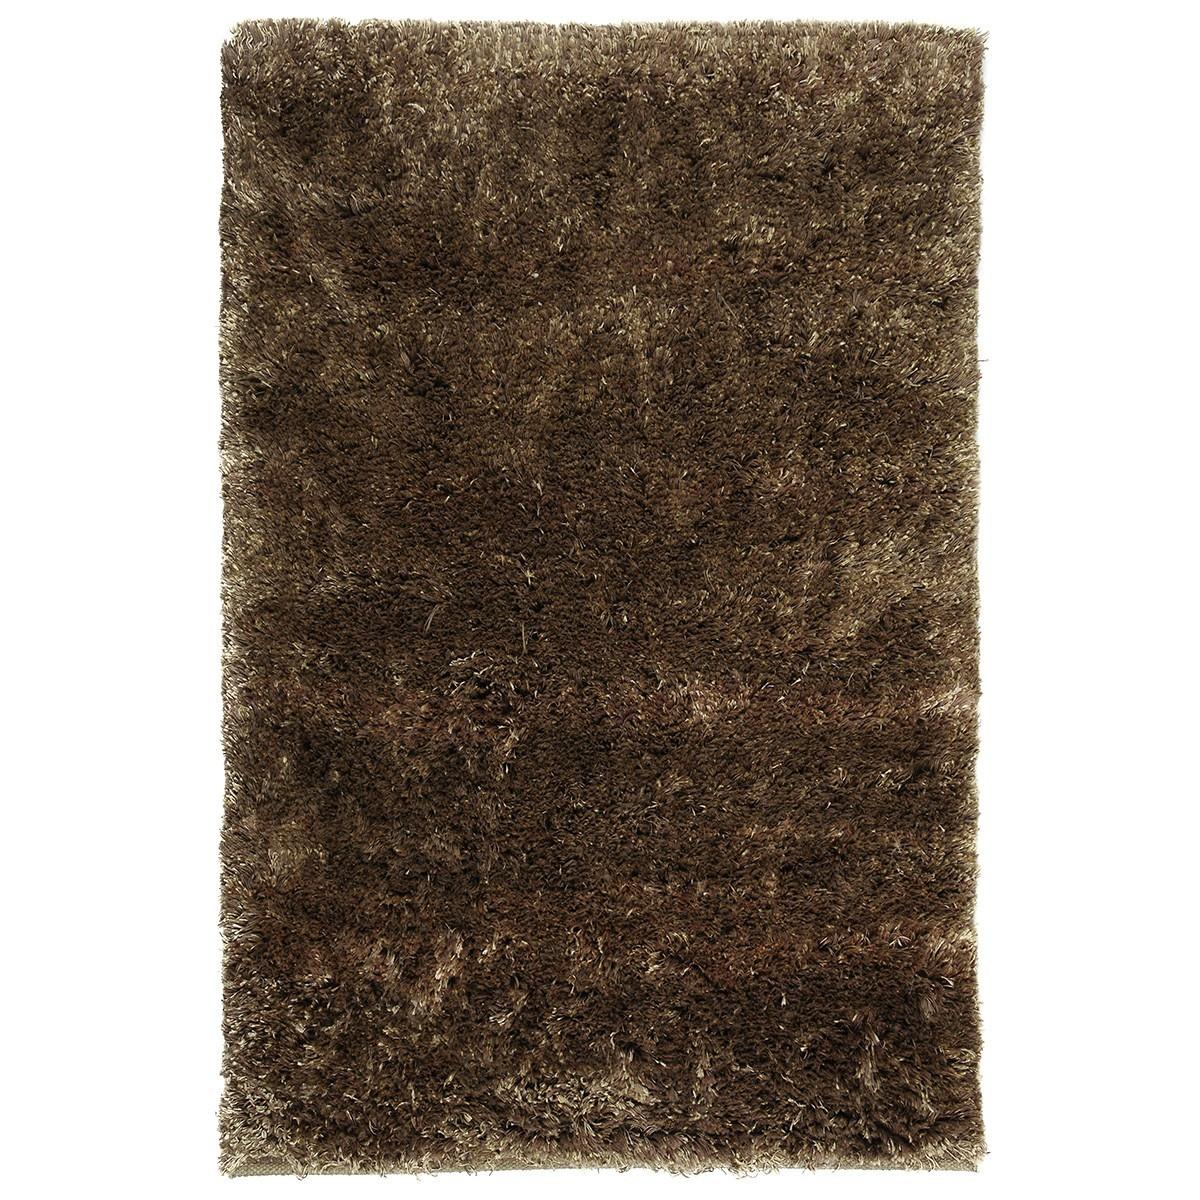 Angora Lux Wool & Viscose Shaggy Rug, 275x185cm, Camel